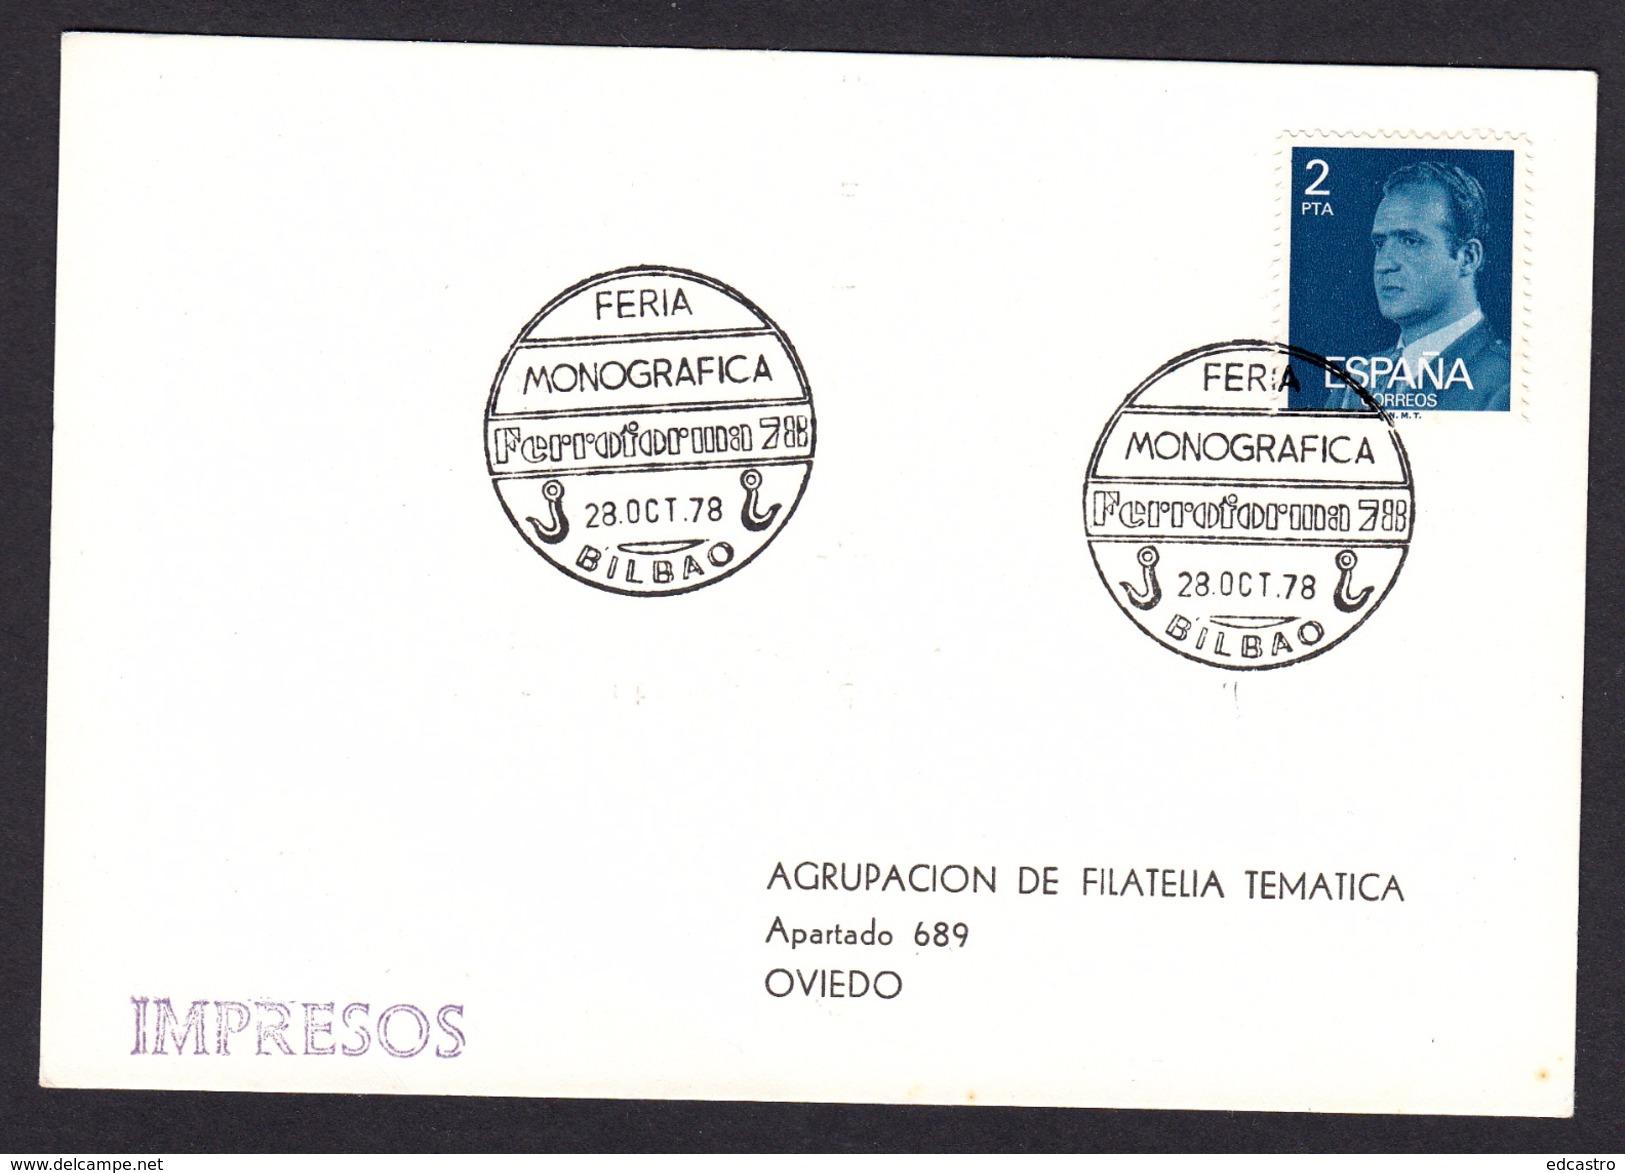 SPAIN 1978 SPECIAL POSTMARK IRON INDUSTRY - EXHIBITION  OF IRON SHAPE BILBAO VICAYA PAIS VASCO - Fábricas Y Industrias